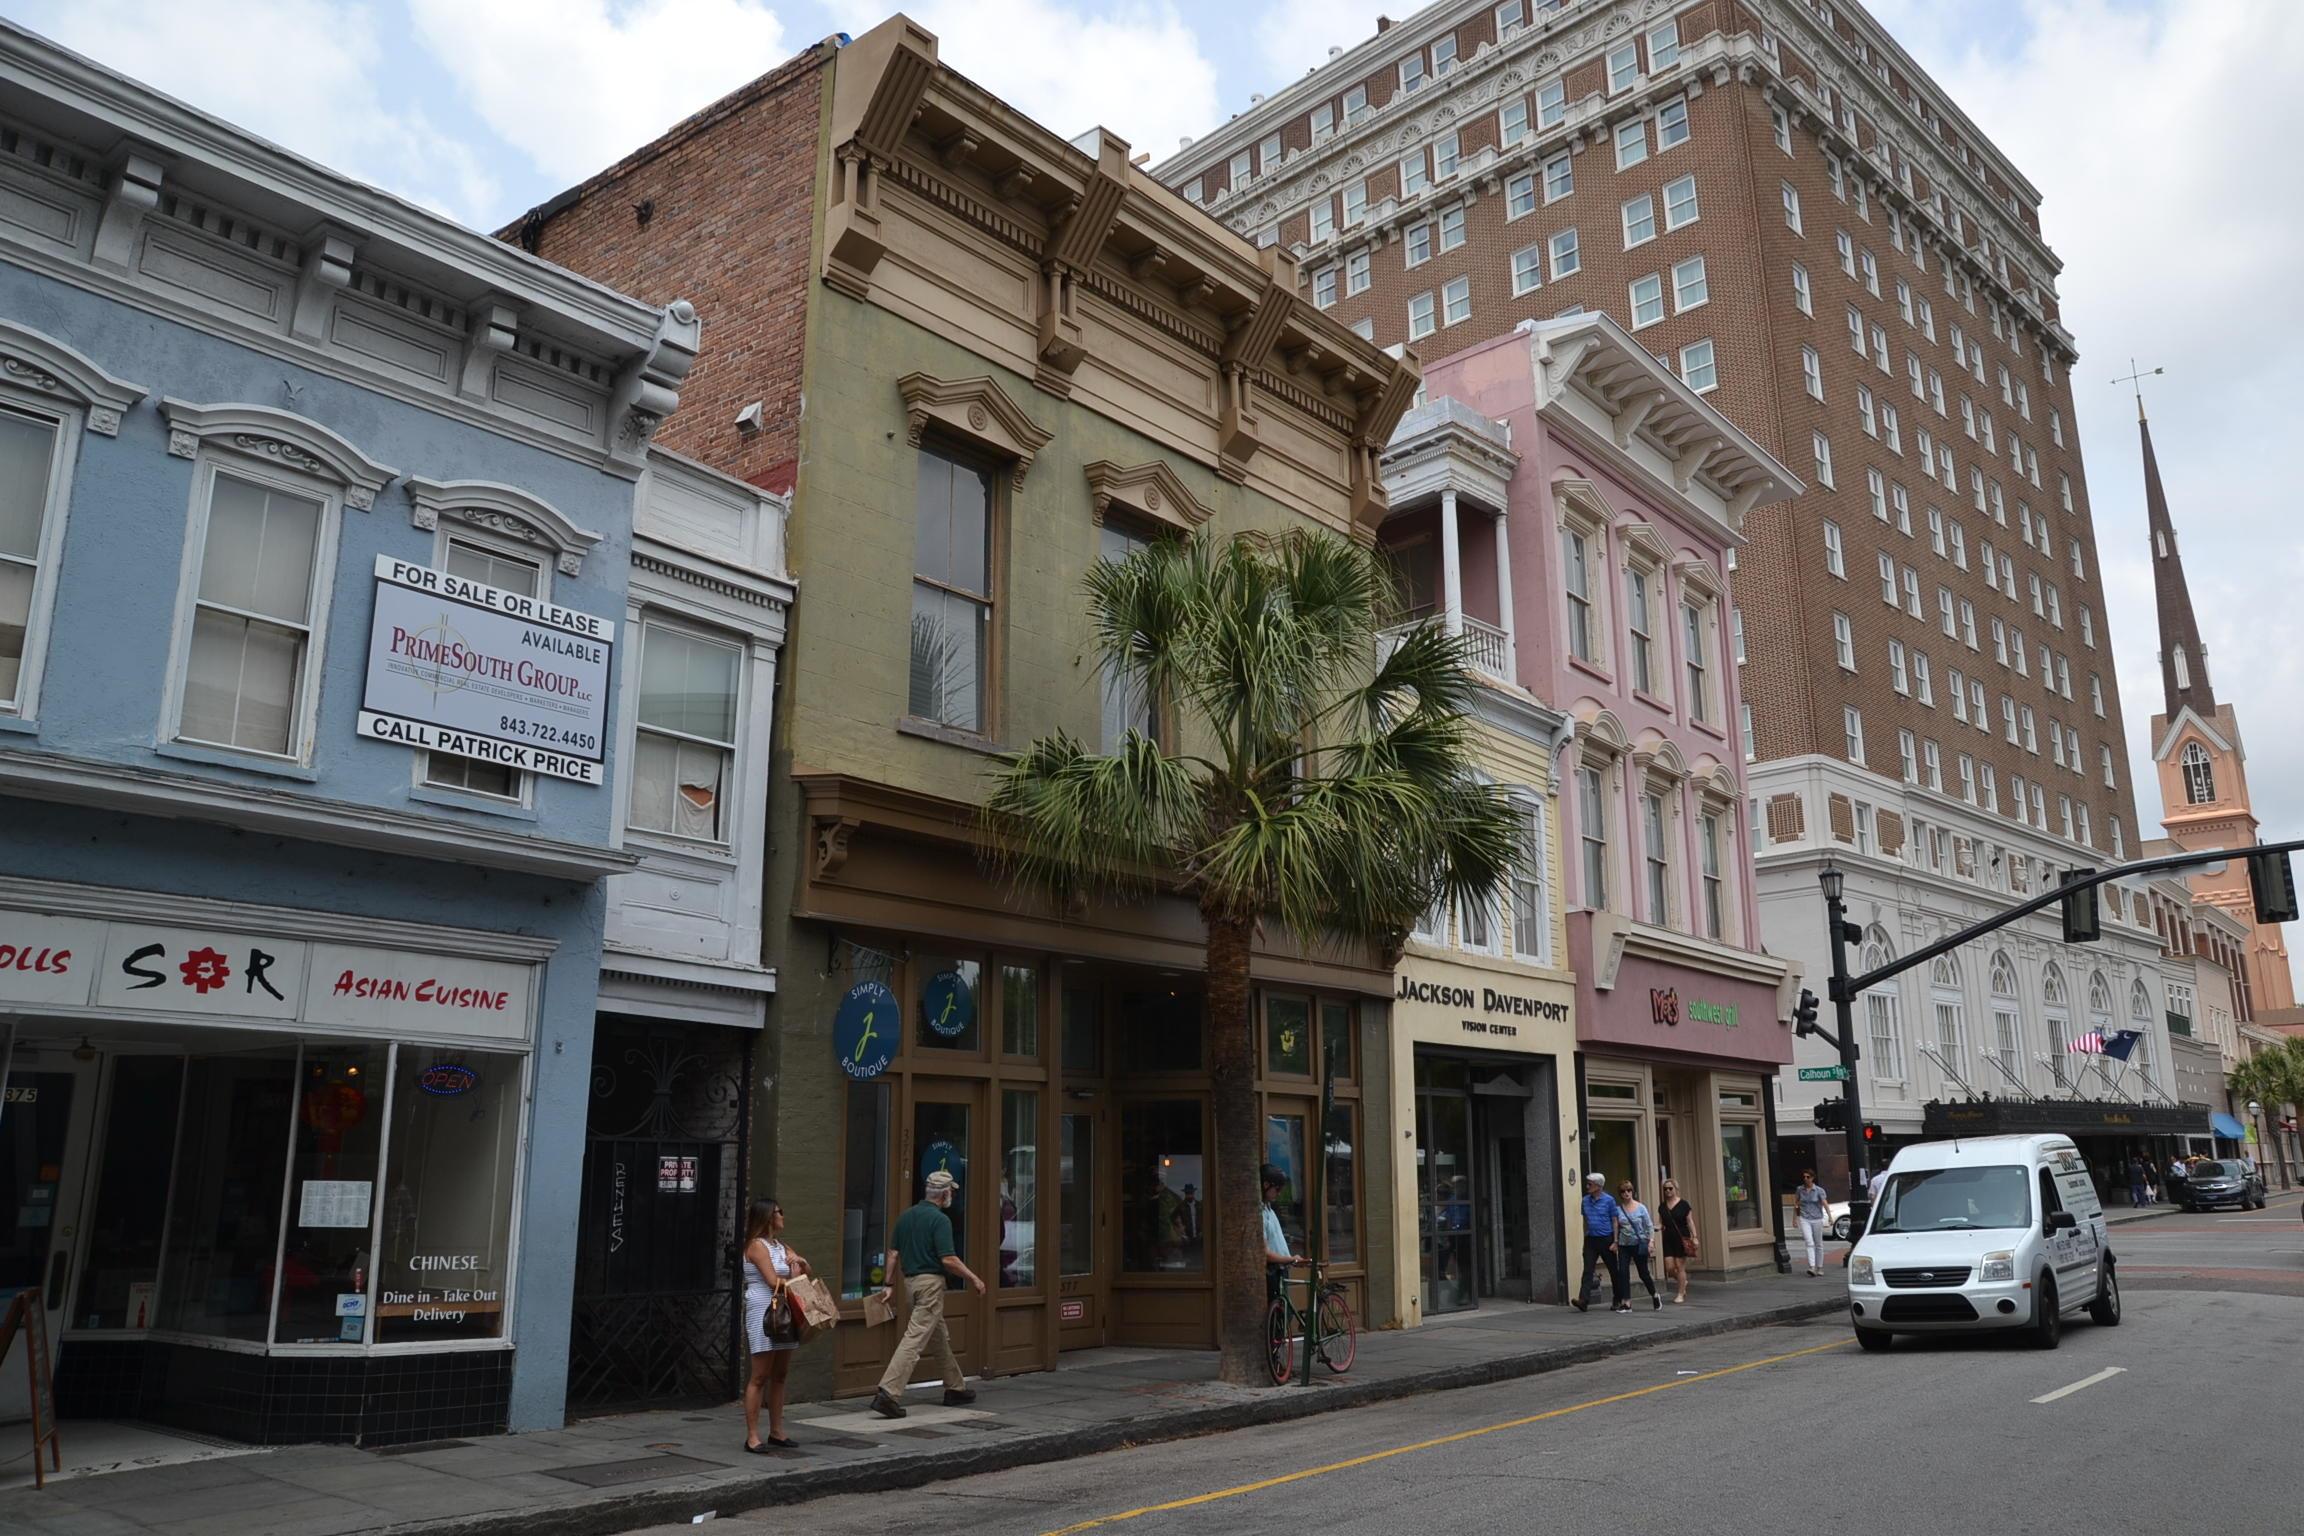 377 King Street, Charleston, South Carolina